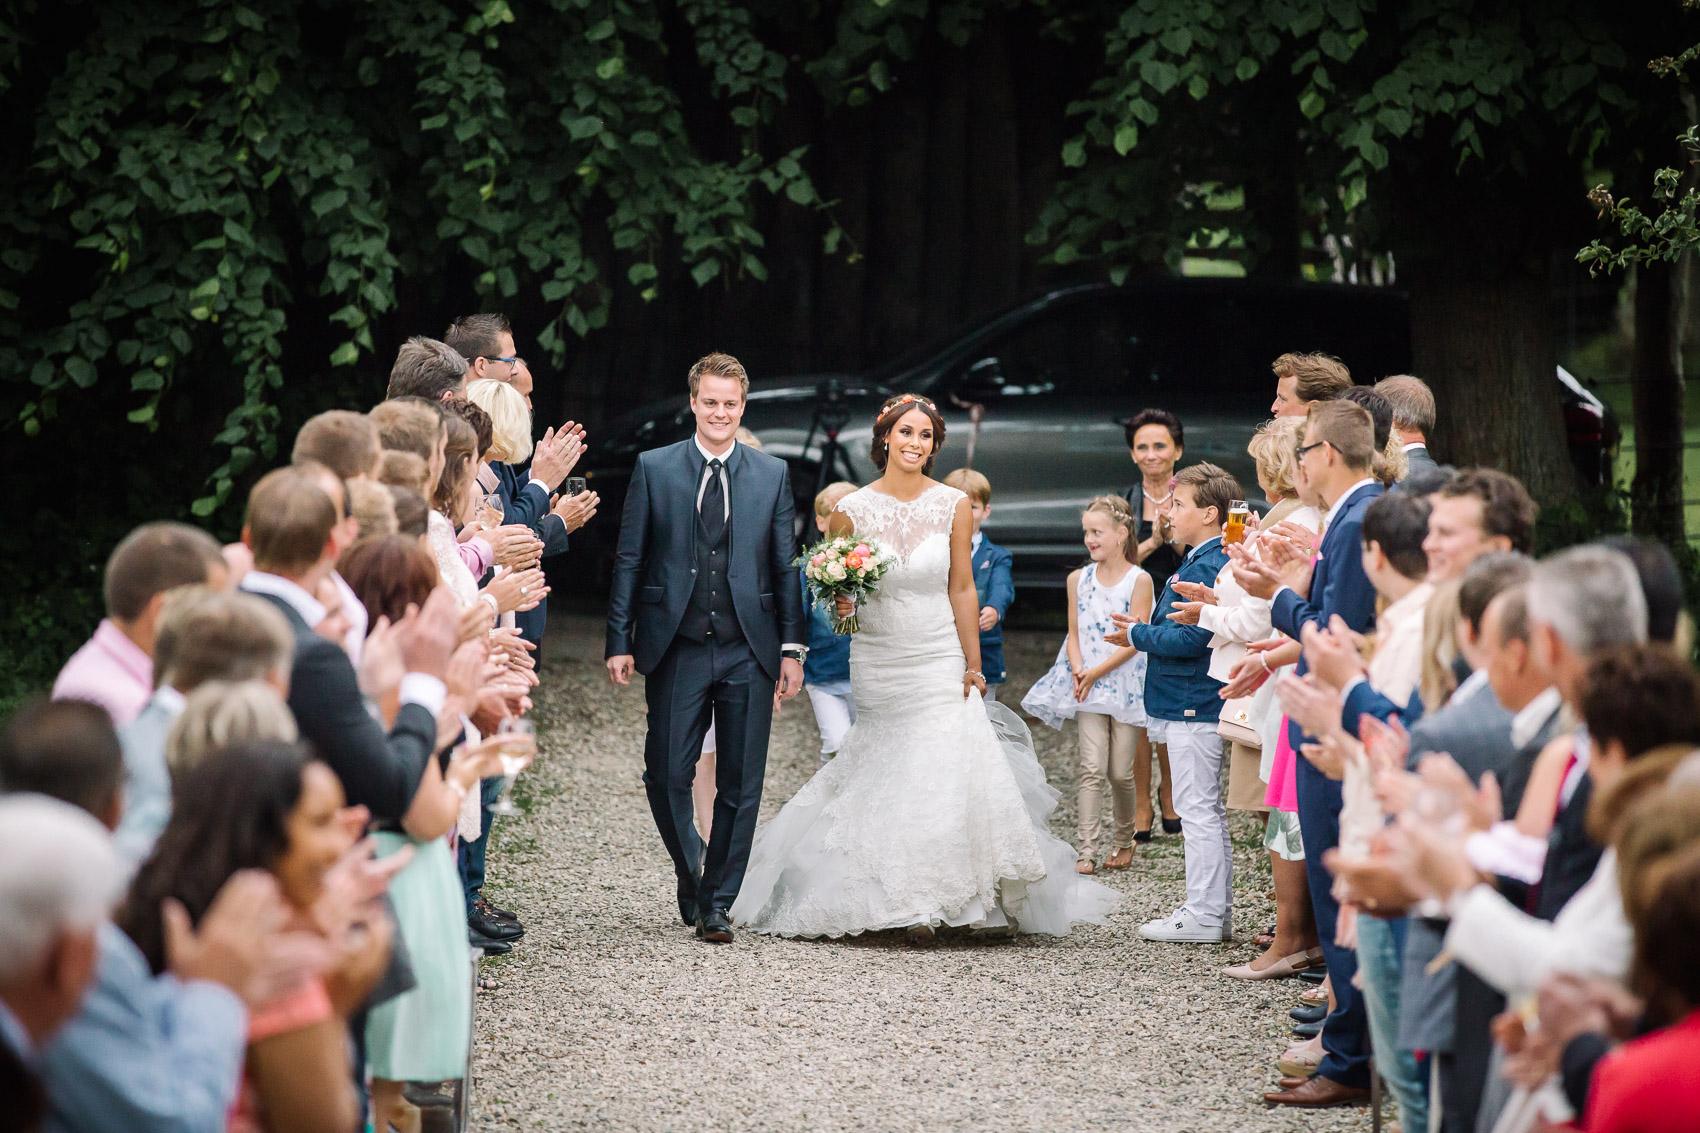 Wedding Orangerie Elswout